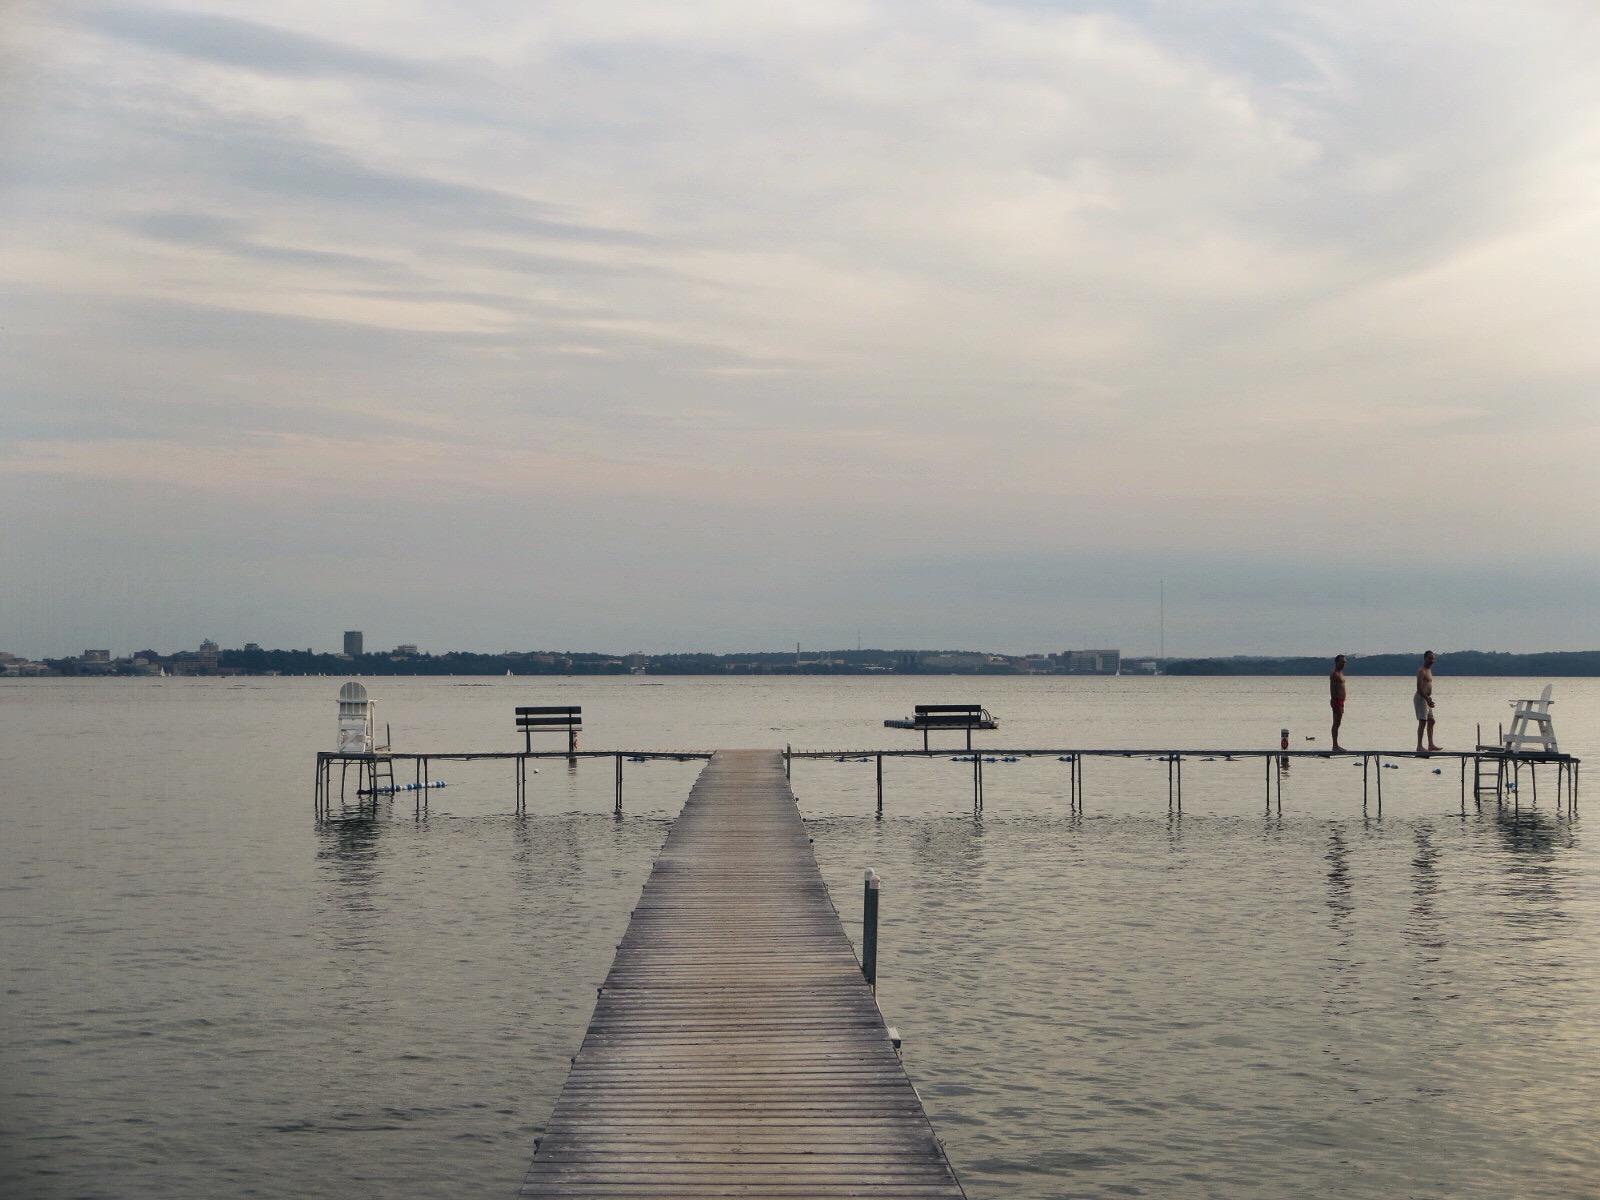 Lake mendota, Madison, wisconsin. Photo: @tobiassupplyco